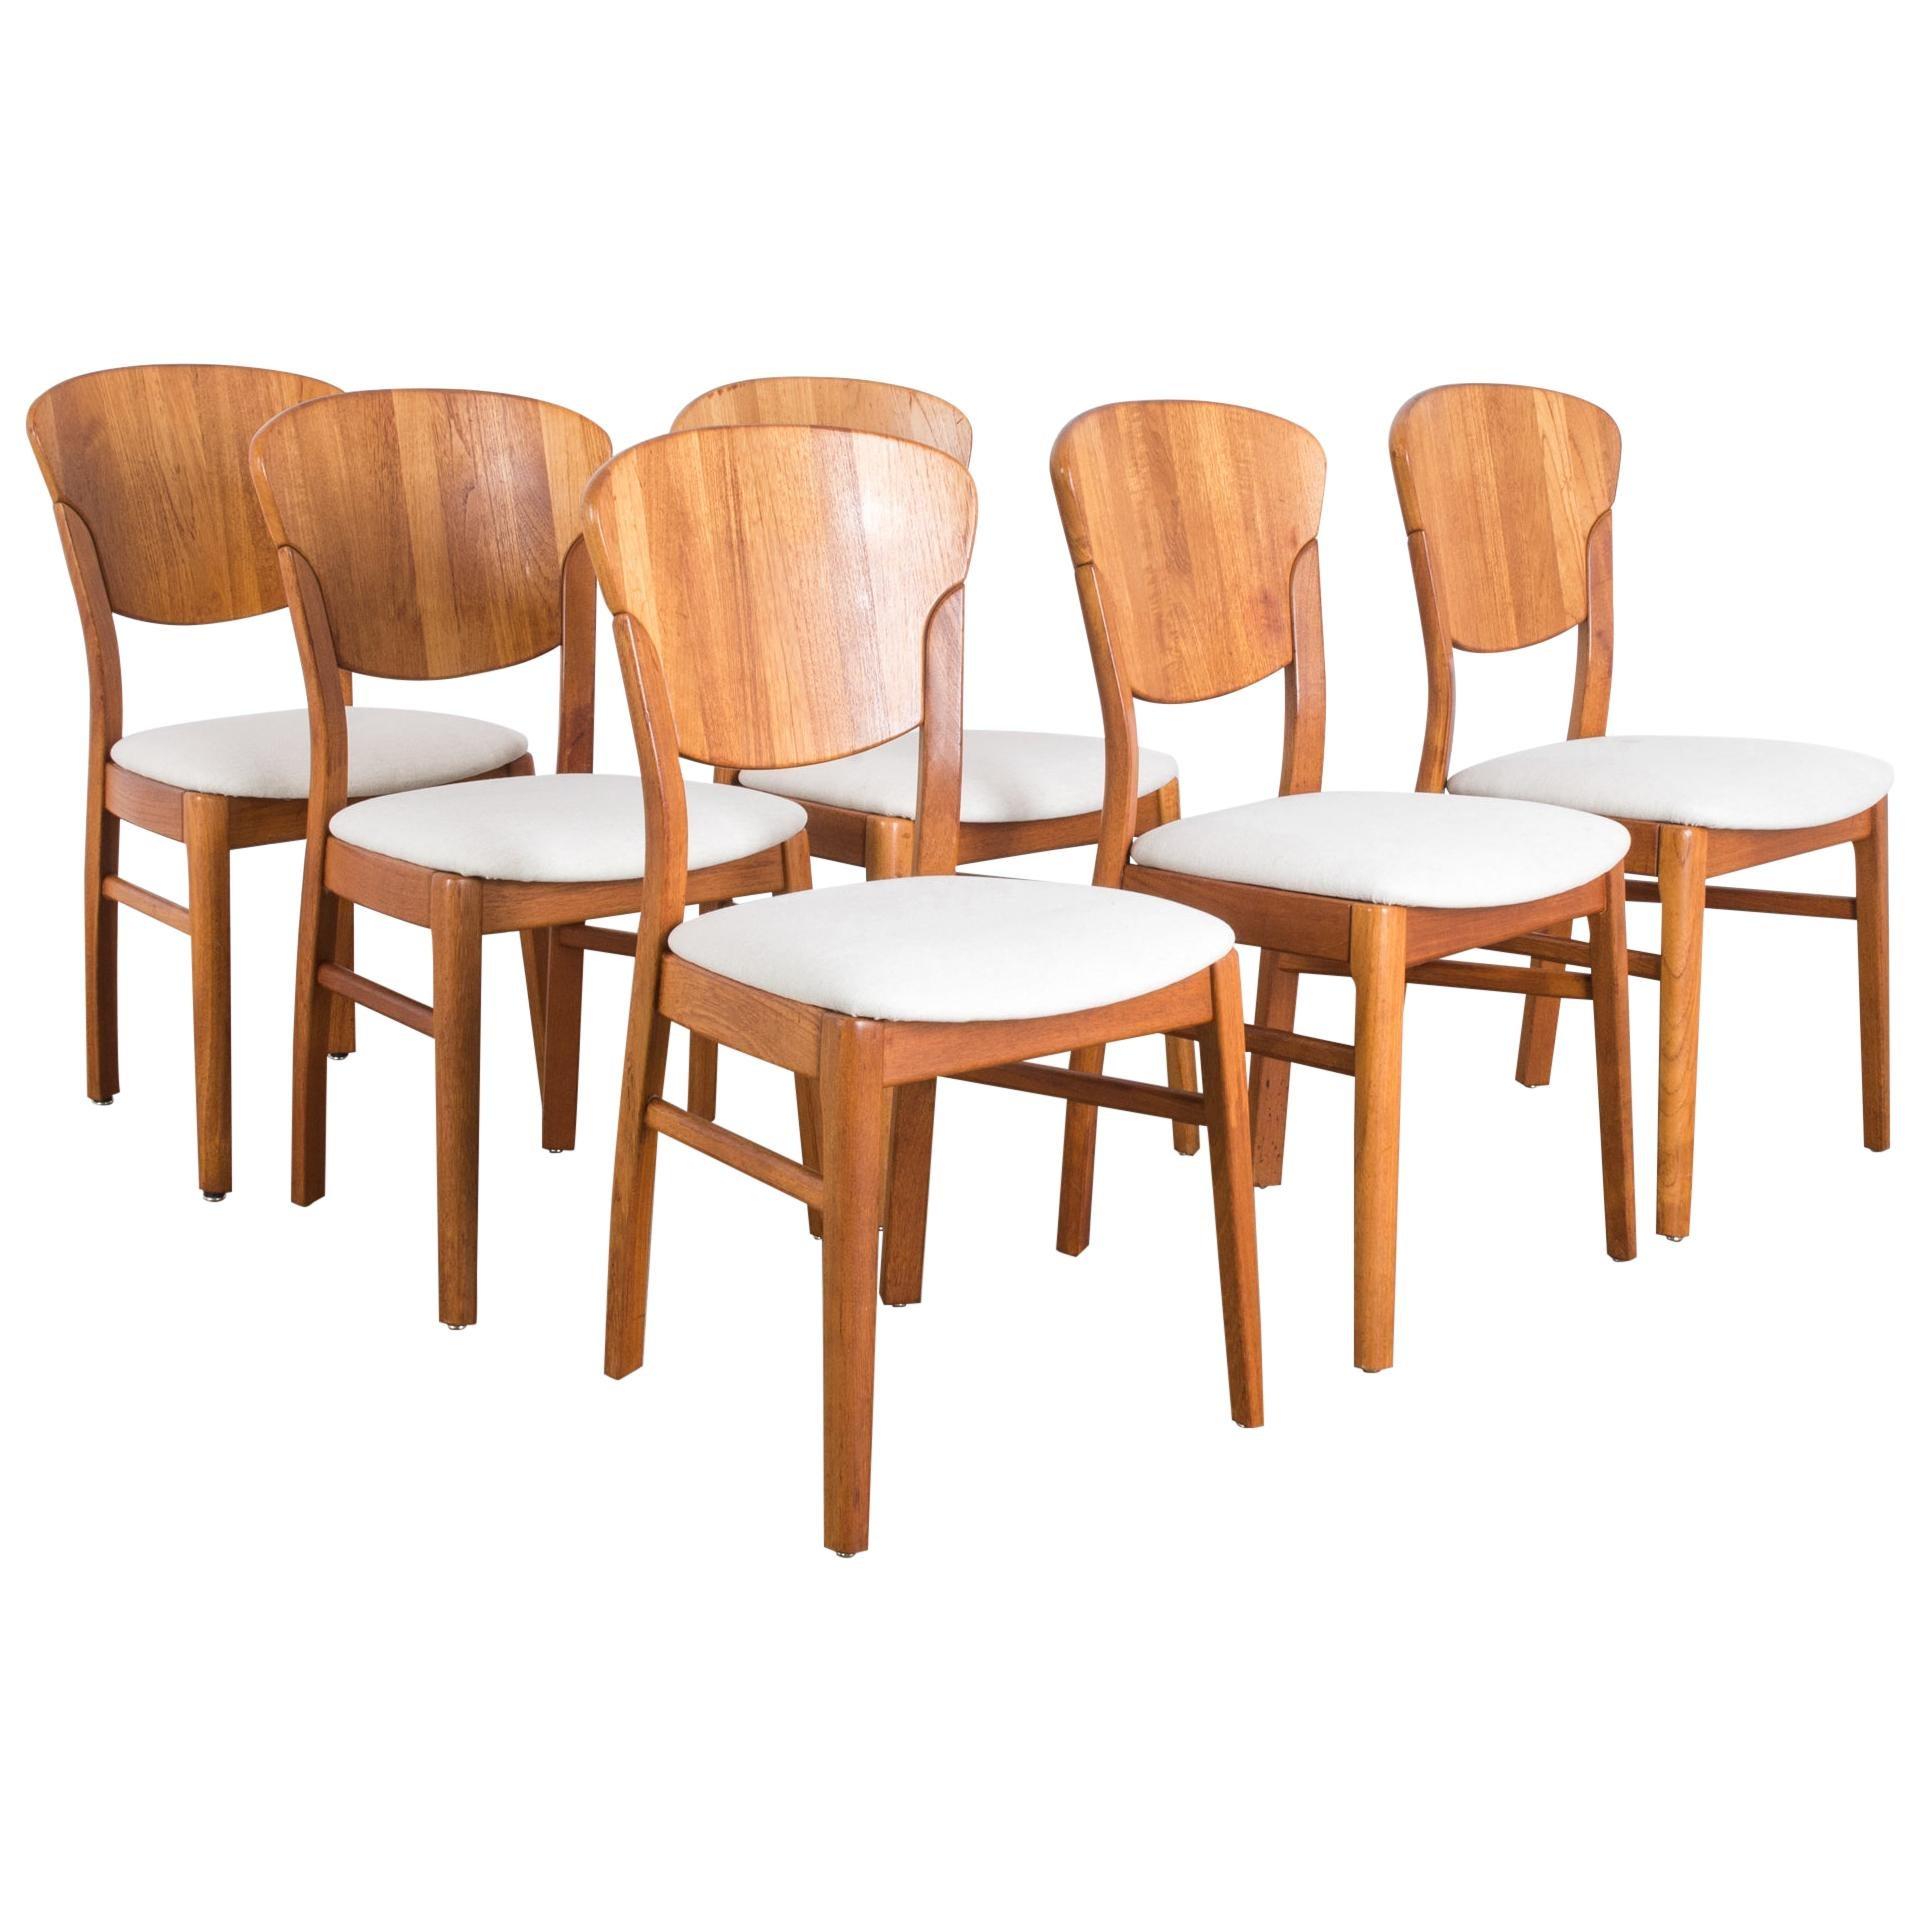 Danish Modern Dining Chairs by Glostrup Møbelfabrik, Set of Six